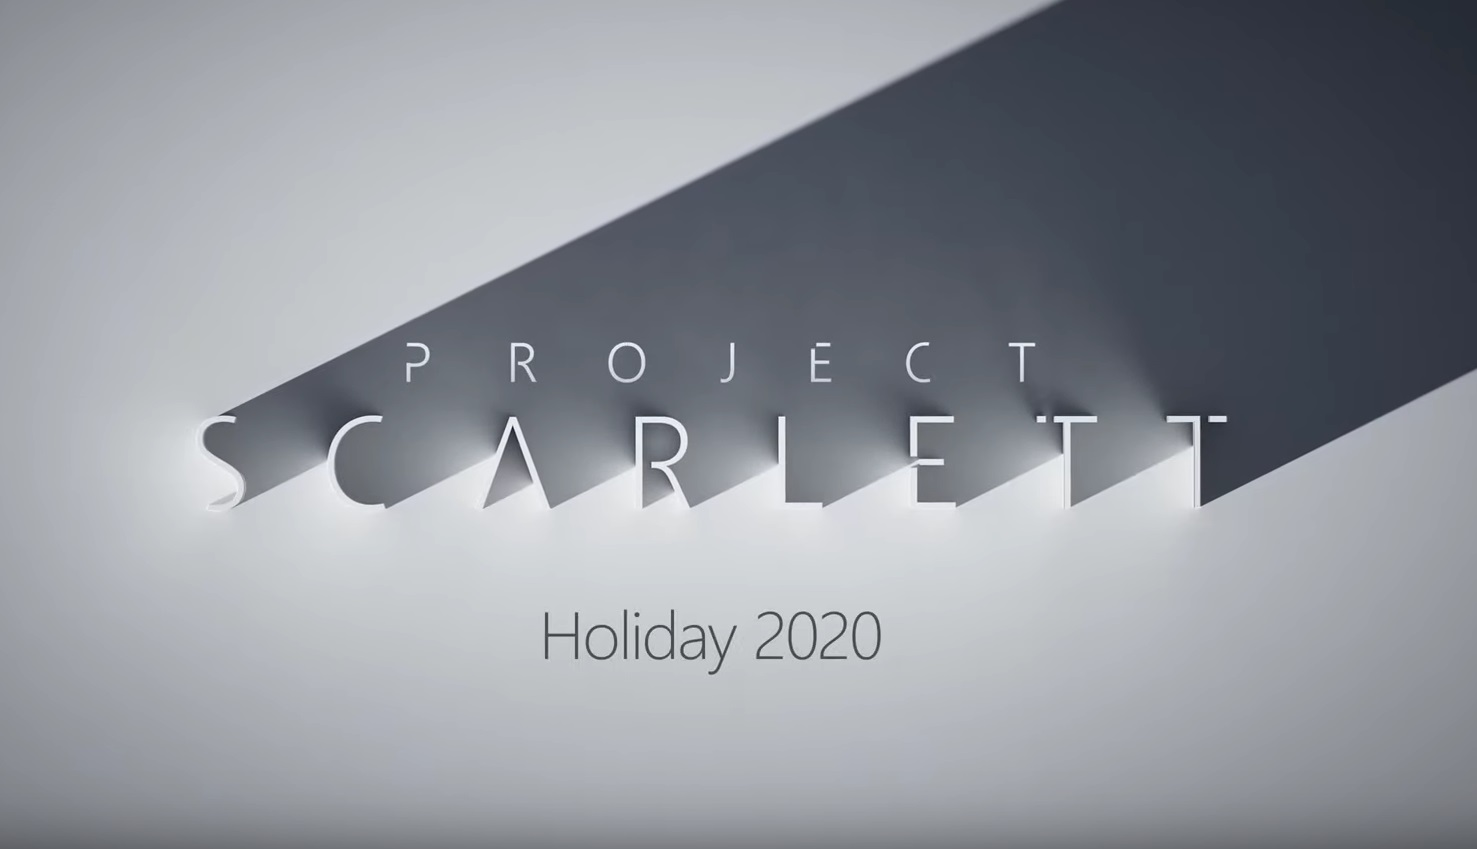 xbox scarlett controller xbox one